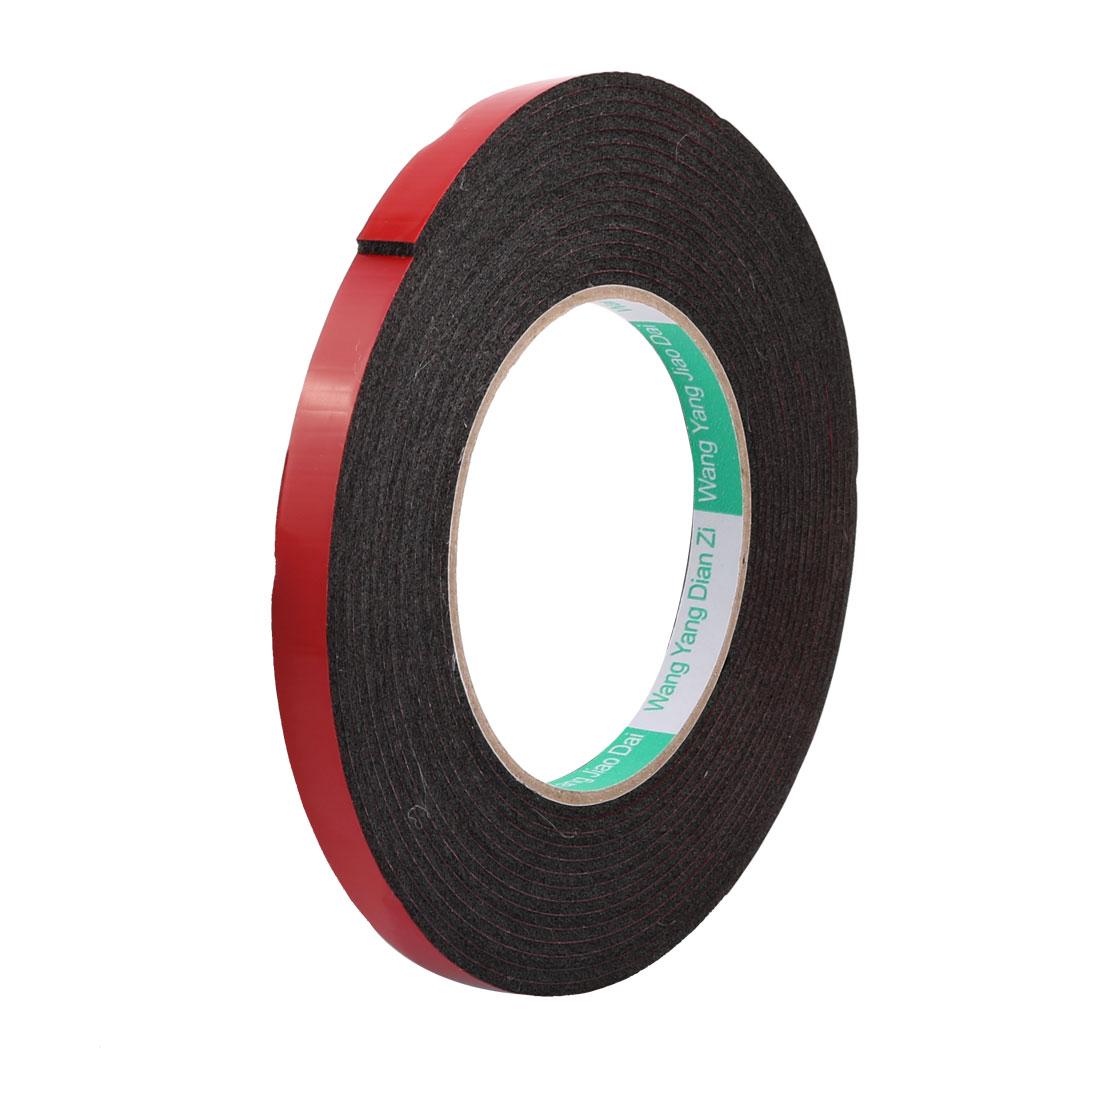 10mmx2mm Double Sided Sponge Tape Adhesive Sticker Foam Glue Strip Sealing 5 Meters